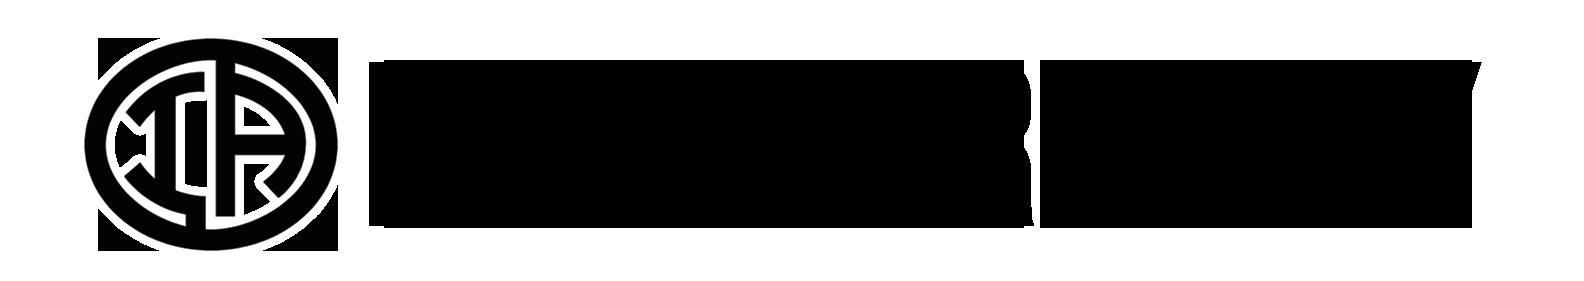 Coaching and Training logo